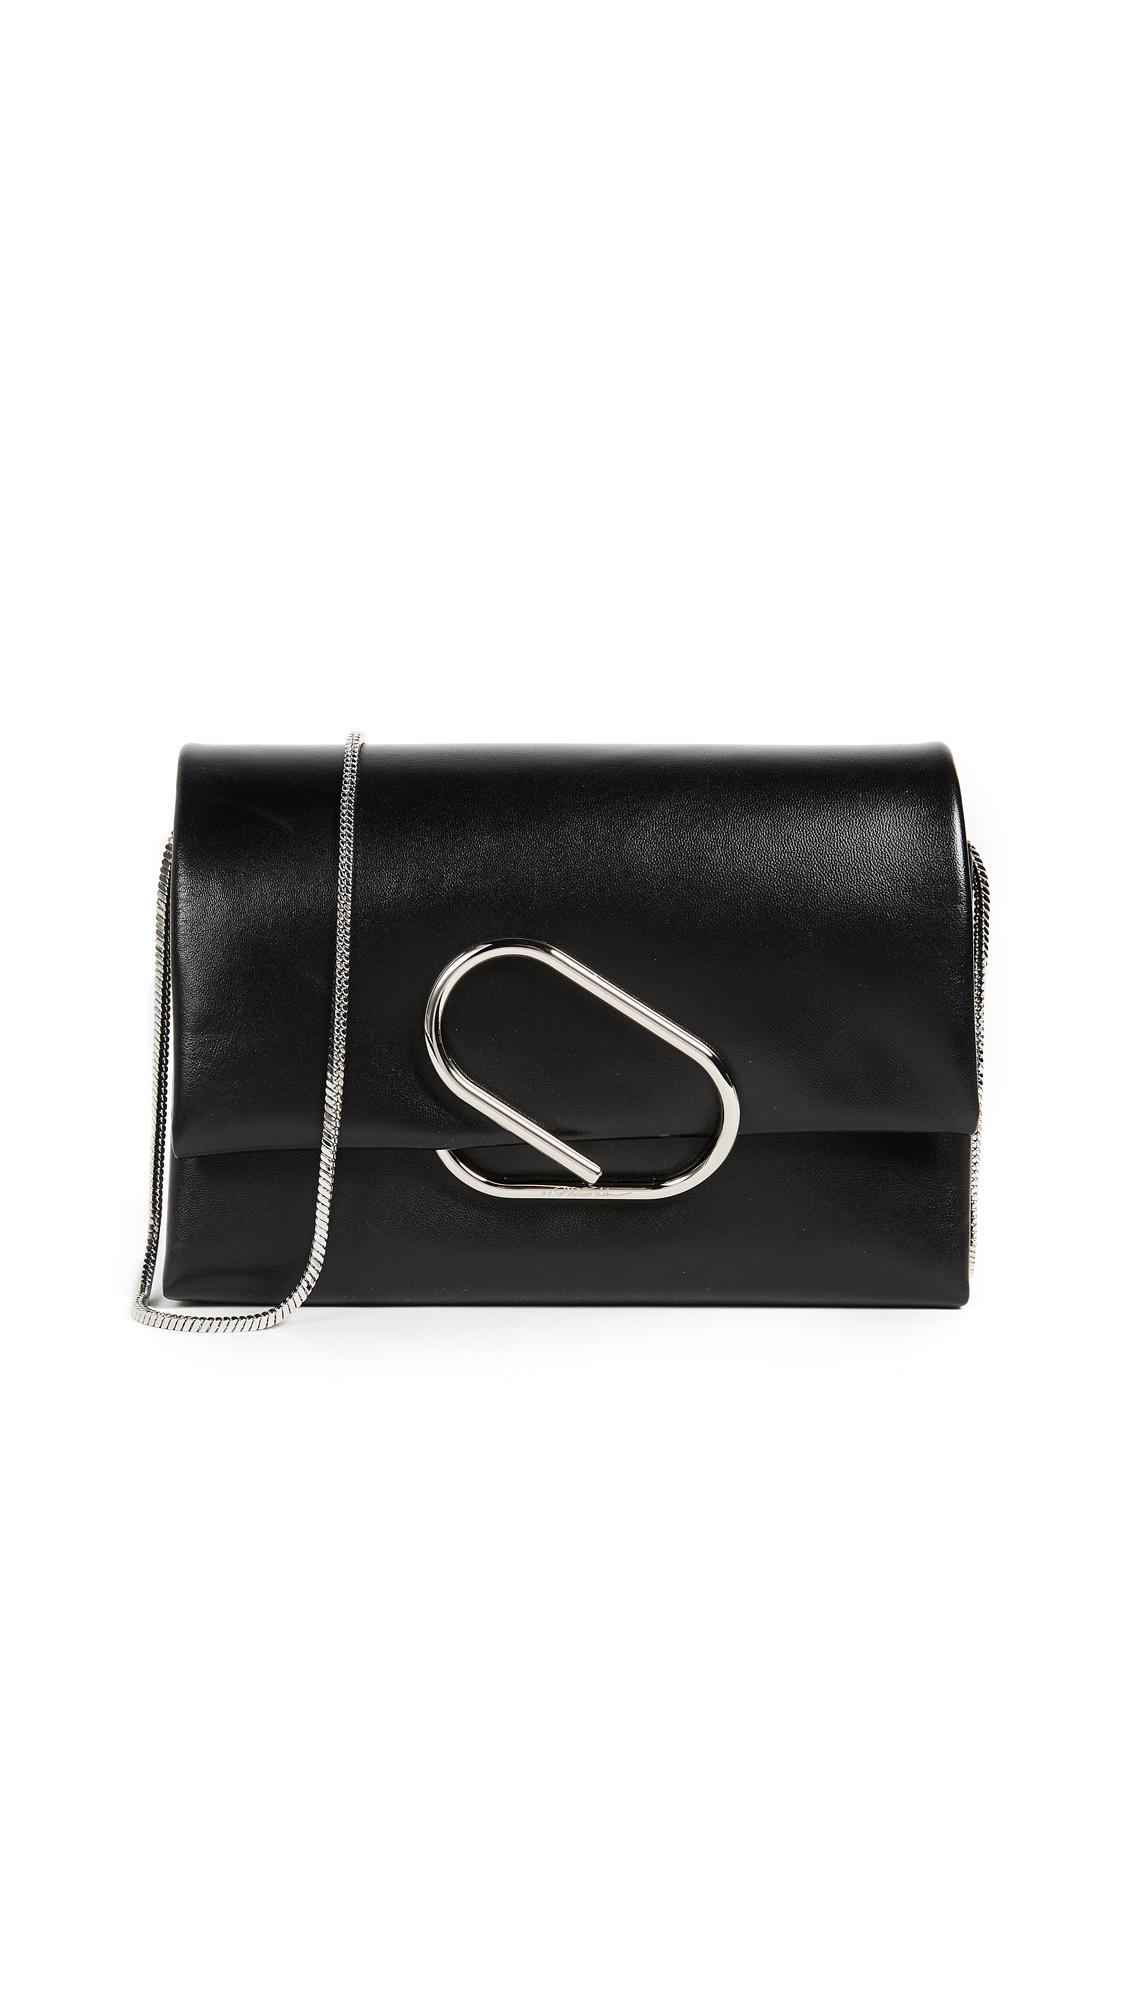 3.1 Phillip Lim Alix Soft Flap Clutch - Black